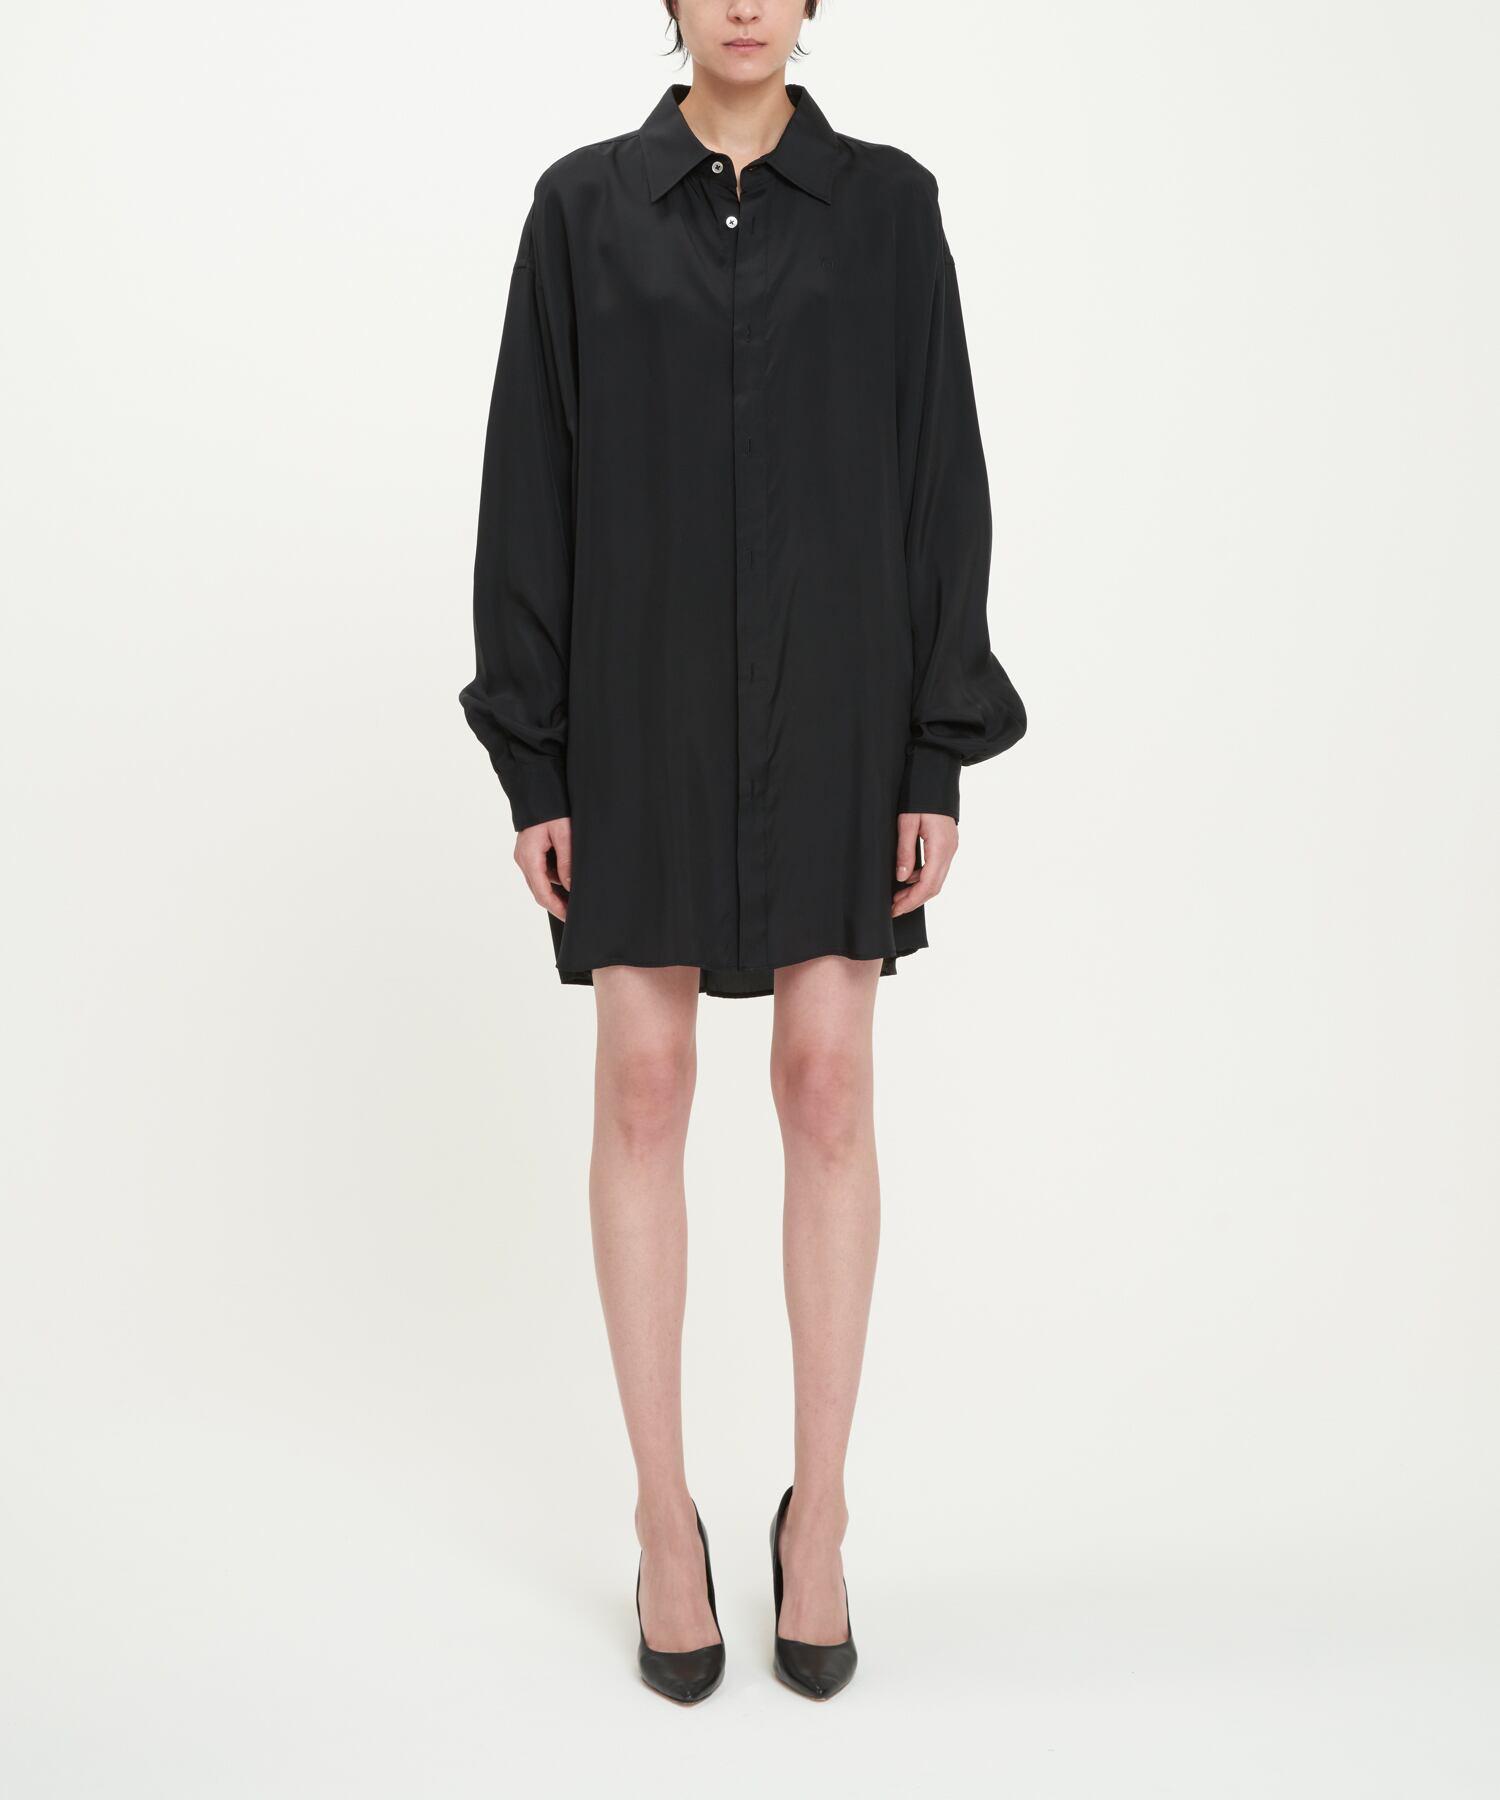 Black Double Buttonhole Oversized Cupro Shirt